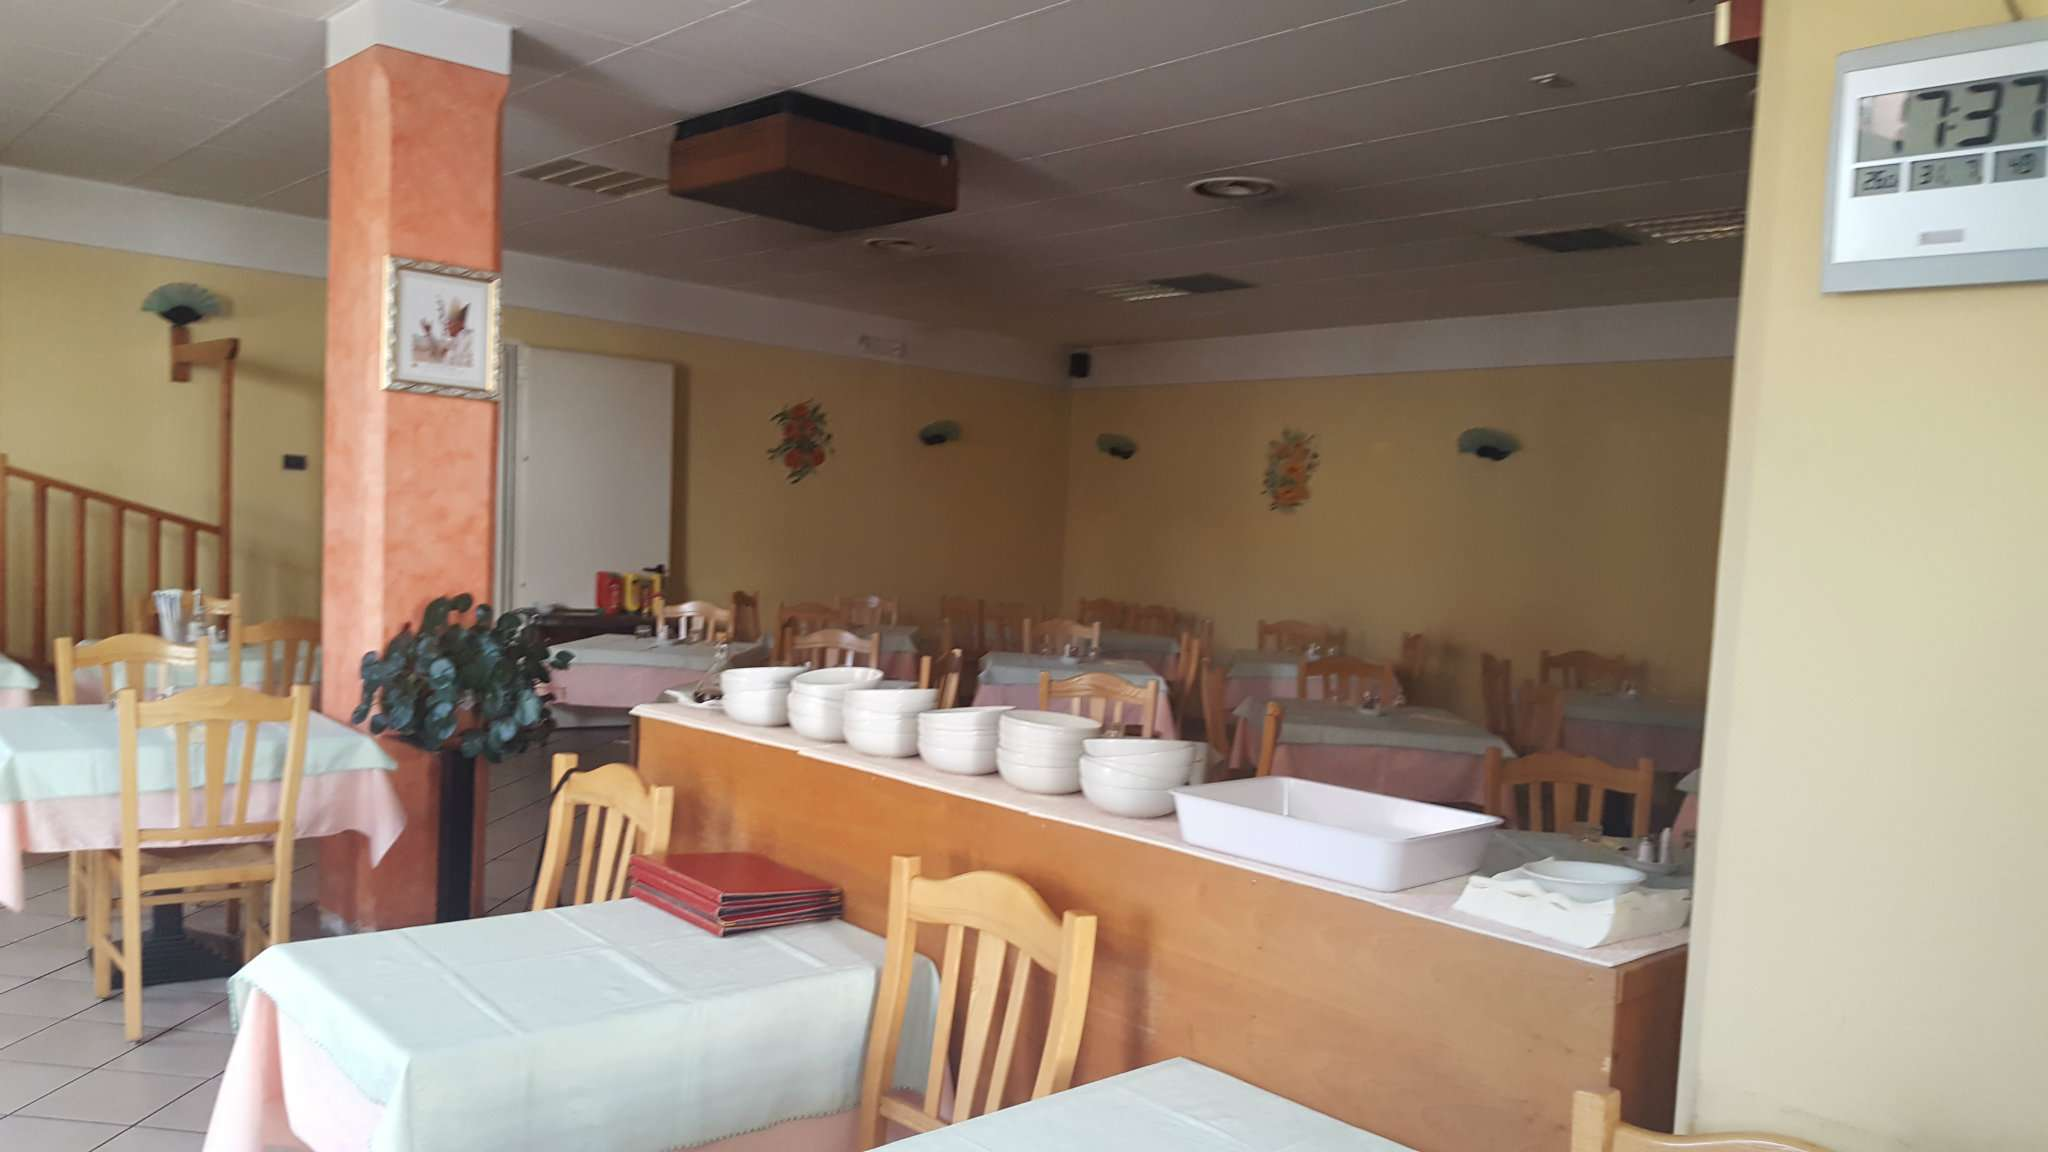 Ristorante / Pizzeria / Trattoria in vendita a Cles, 2 locali, Trattative riservate | CambioCasa.it